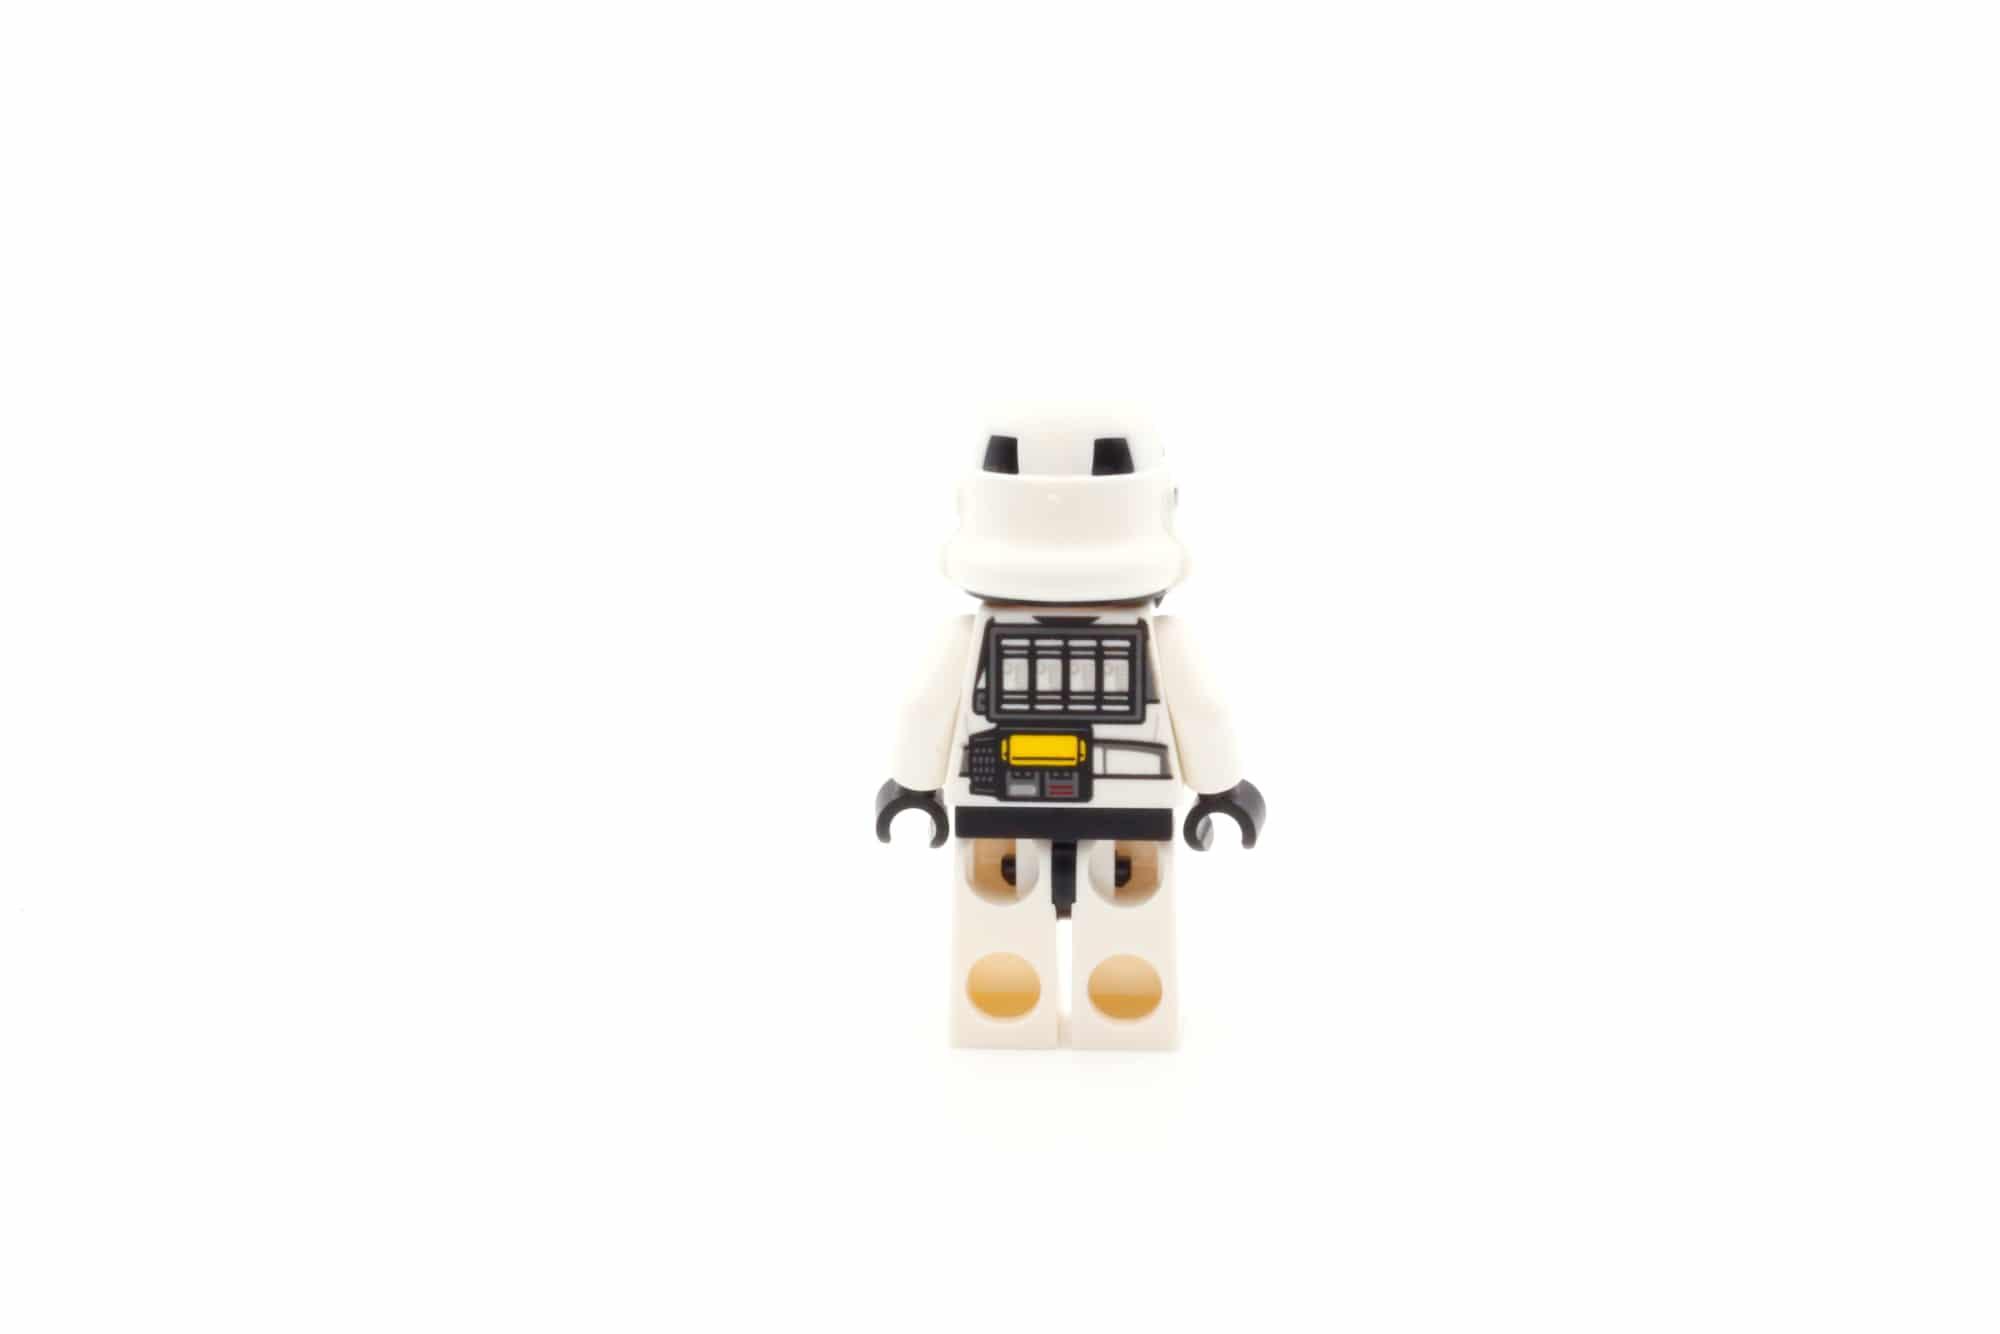 LEGO Star Wars 75311 Imperial Marauder Artillery Trooper Back